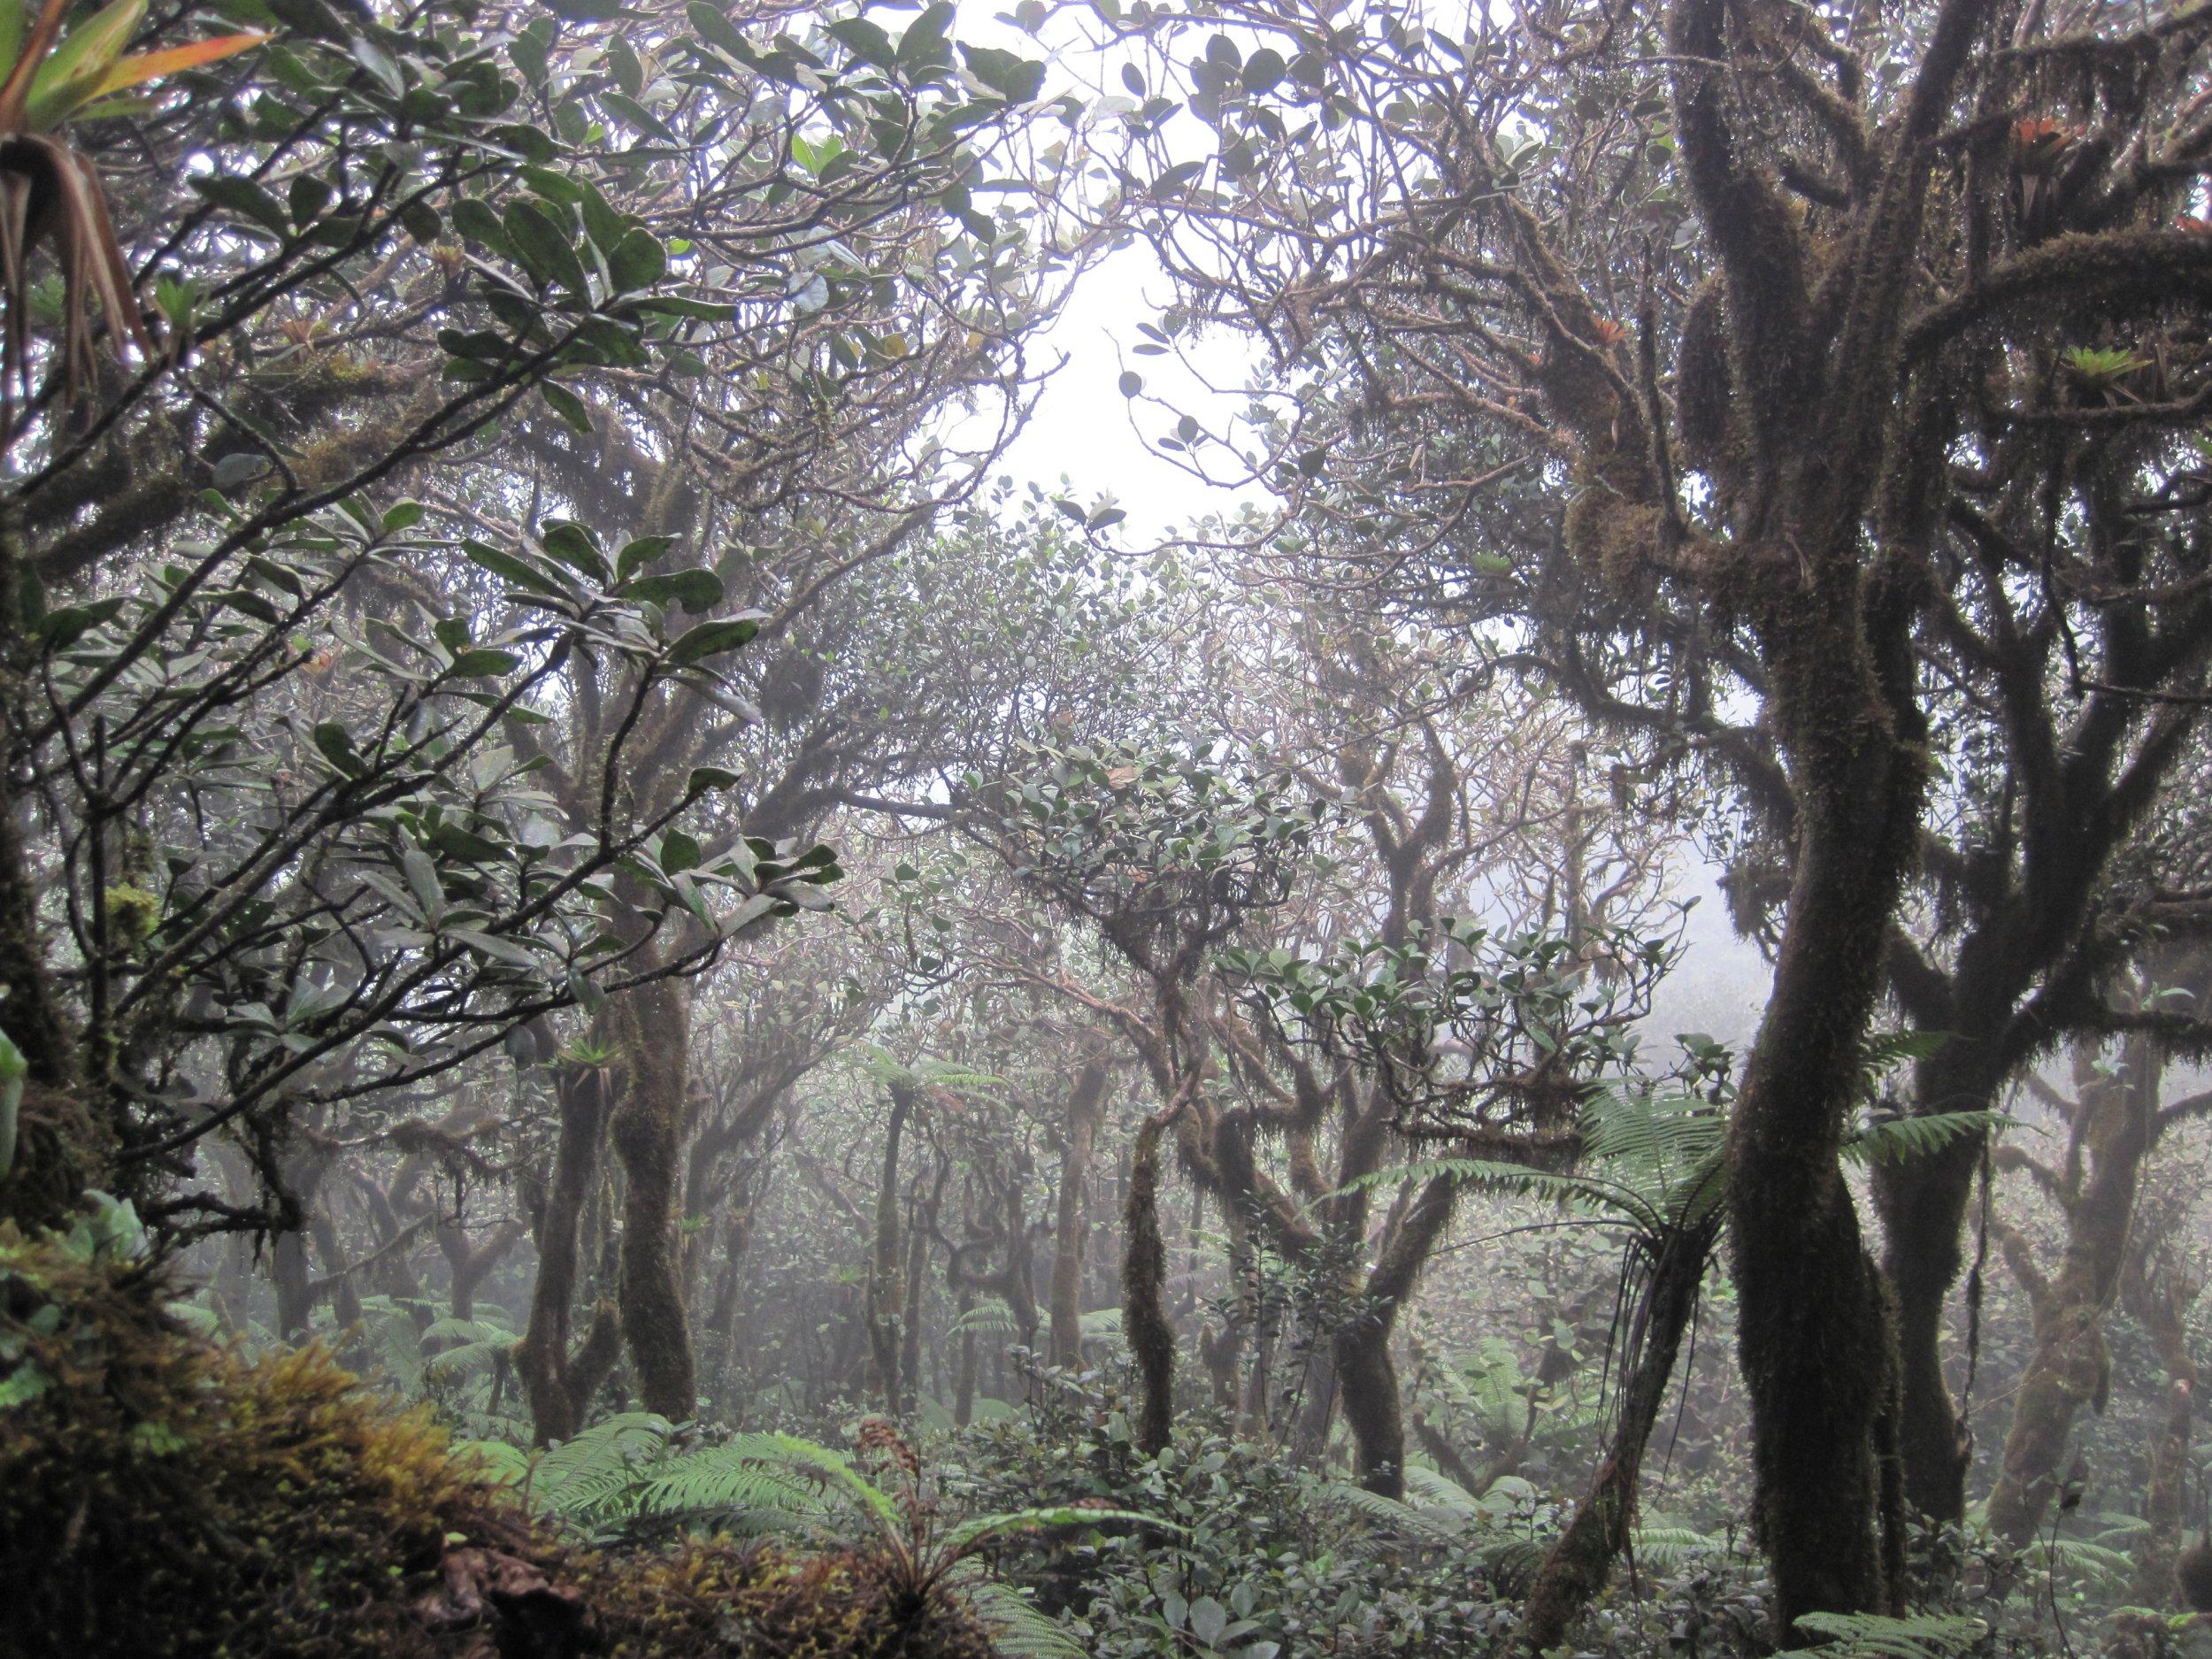 Elfin cloud forest, El Yunque National Forest, Puerto Rico